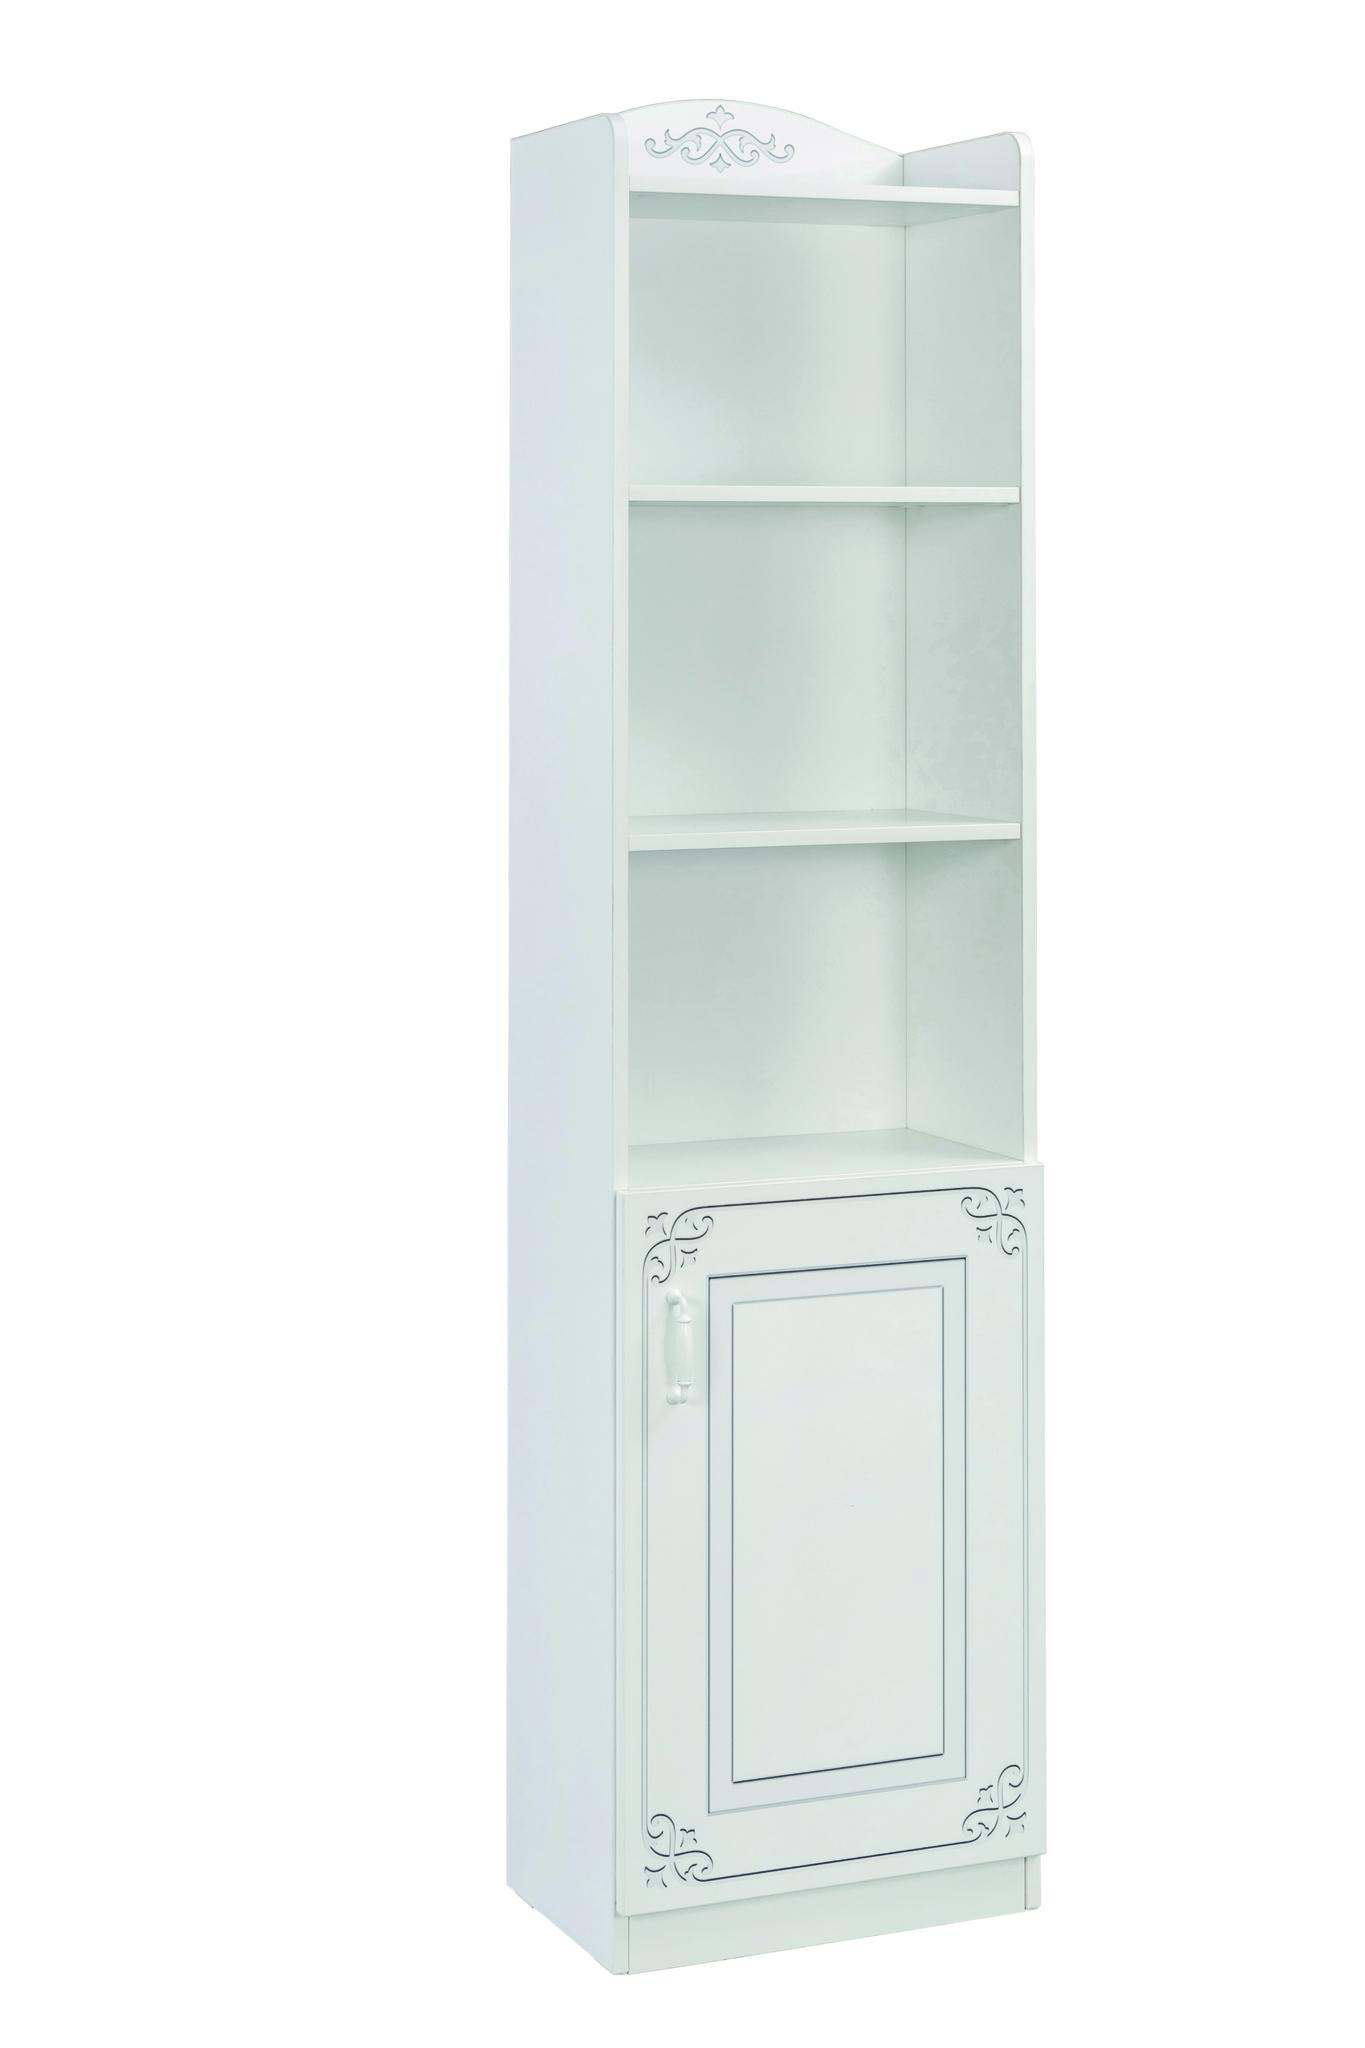 Biblioteca din pal cu 1 usa, pentru tineret Selena White, l46xA34xH185 cm imagine